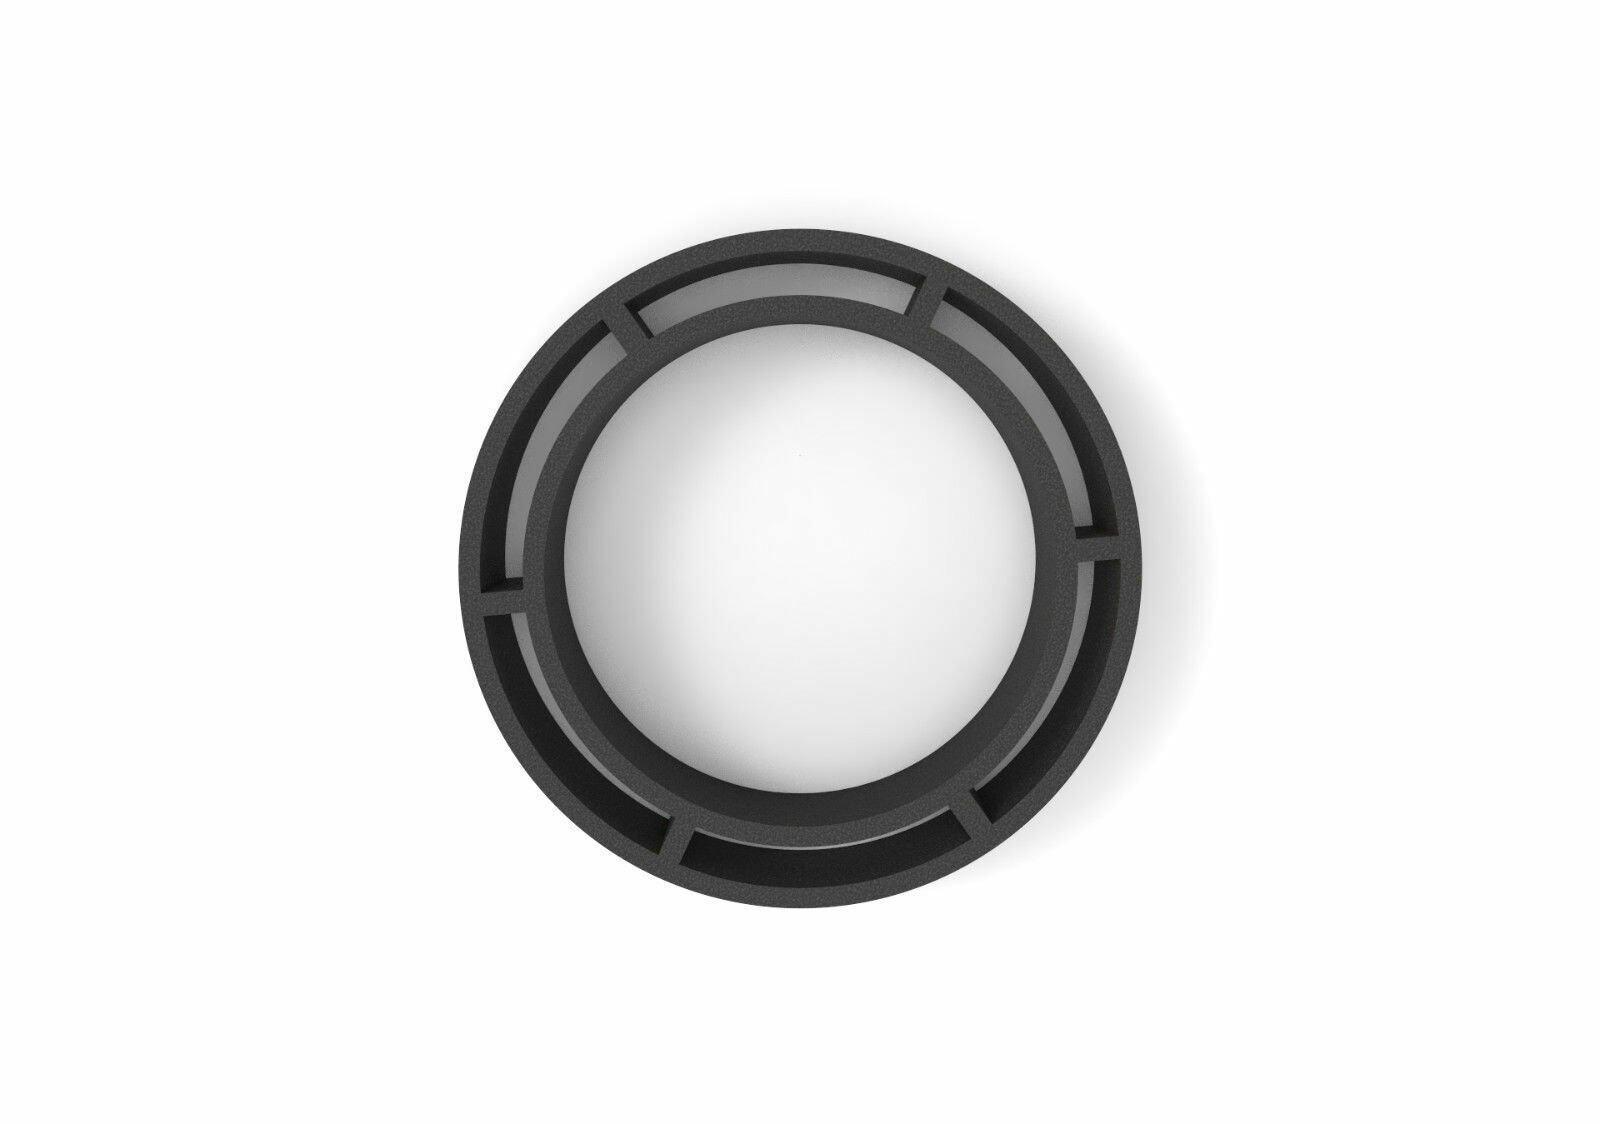 60mm or 52mm air vent gauge pod for Toyota FRS FT86 SCION SUBARU BRZ